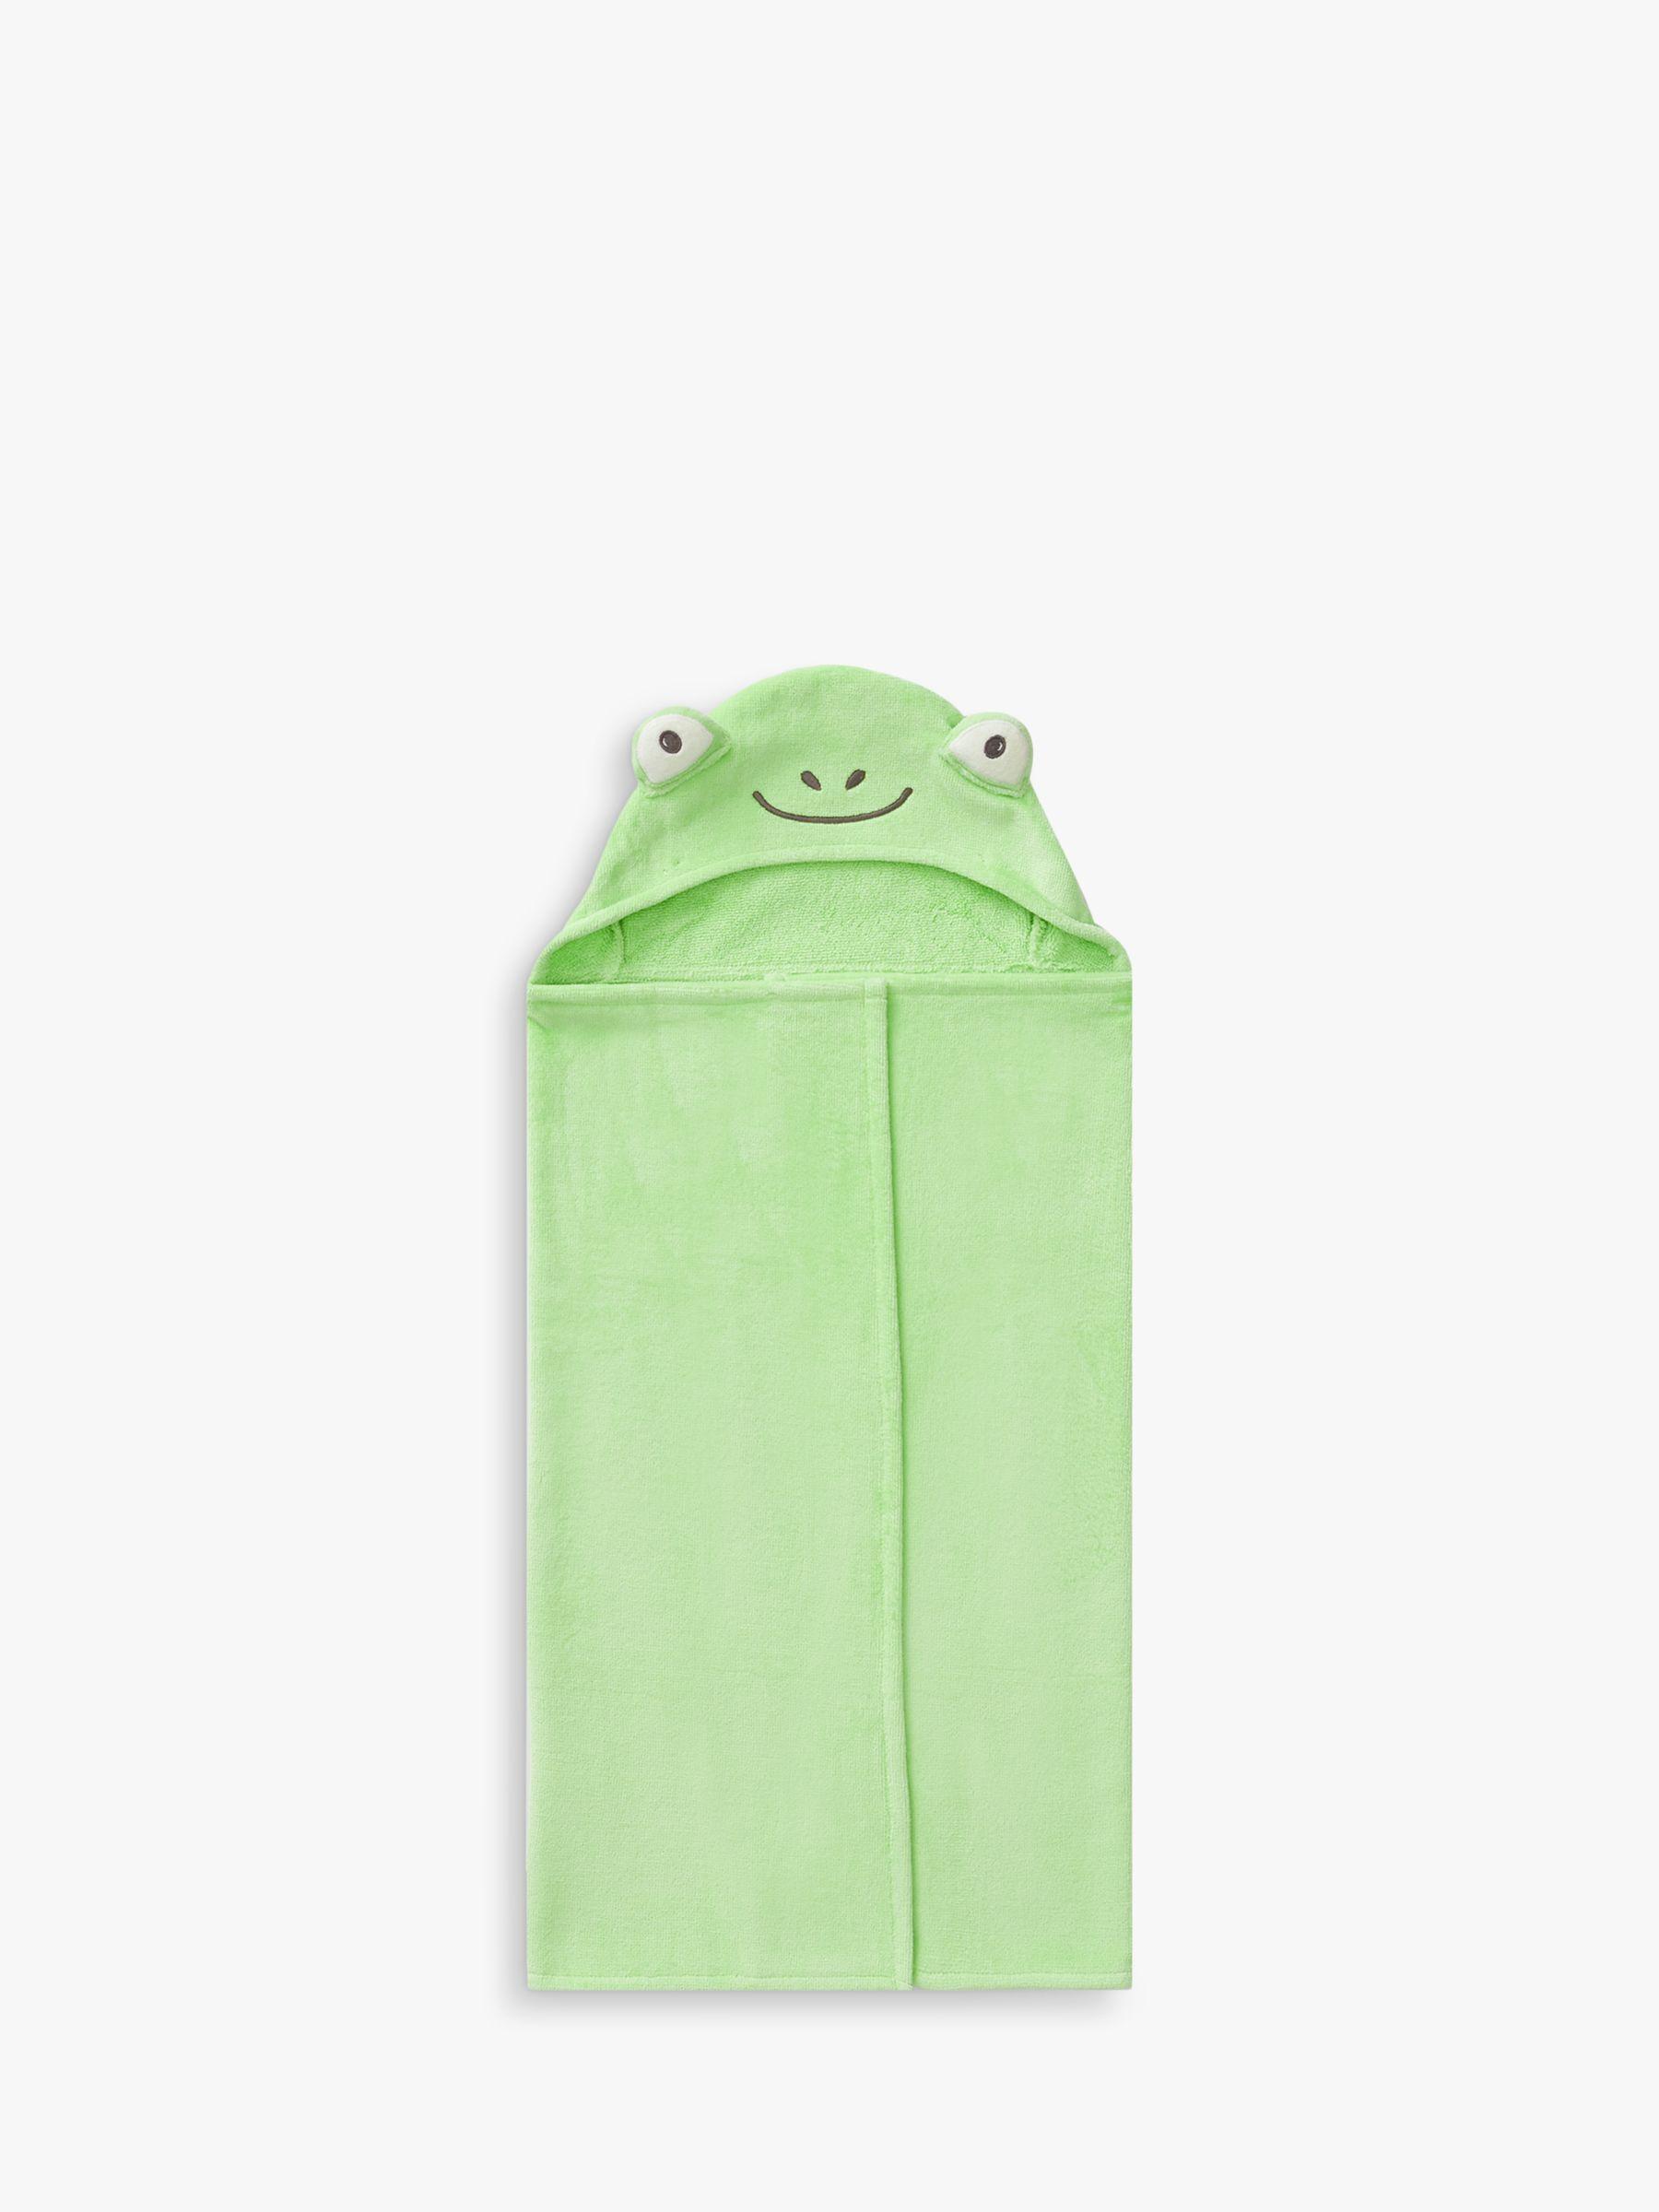 Pottery Barn Kids Frog Hooded Bath Towel, Green